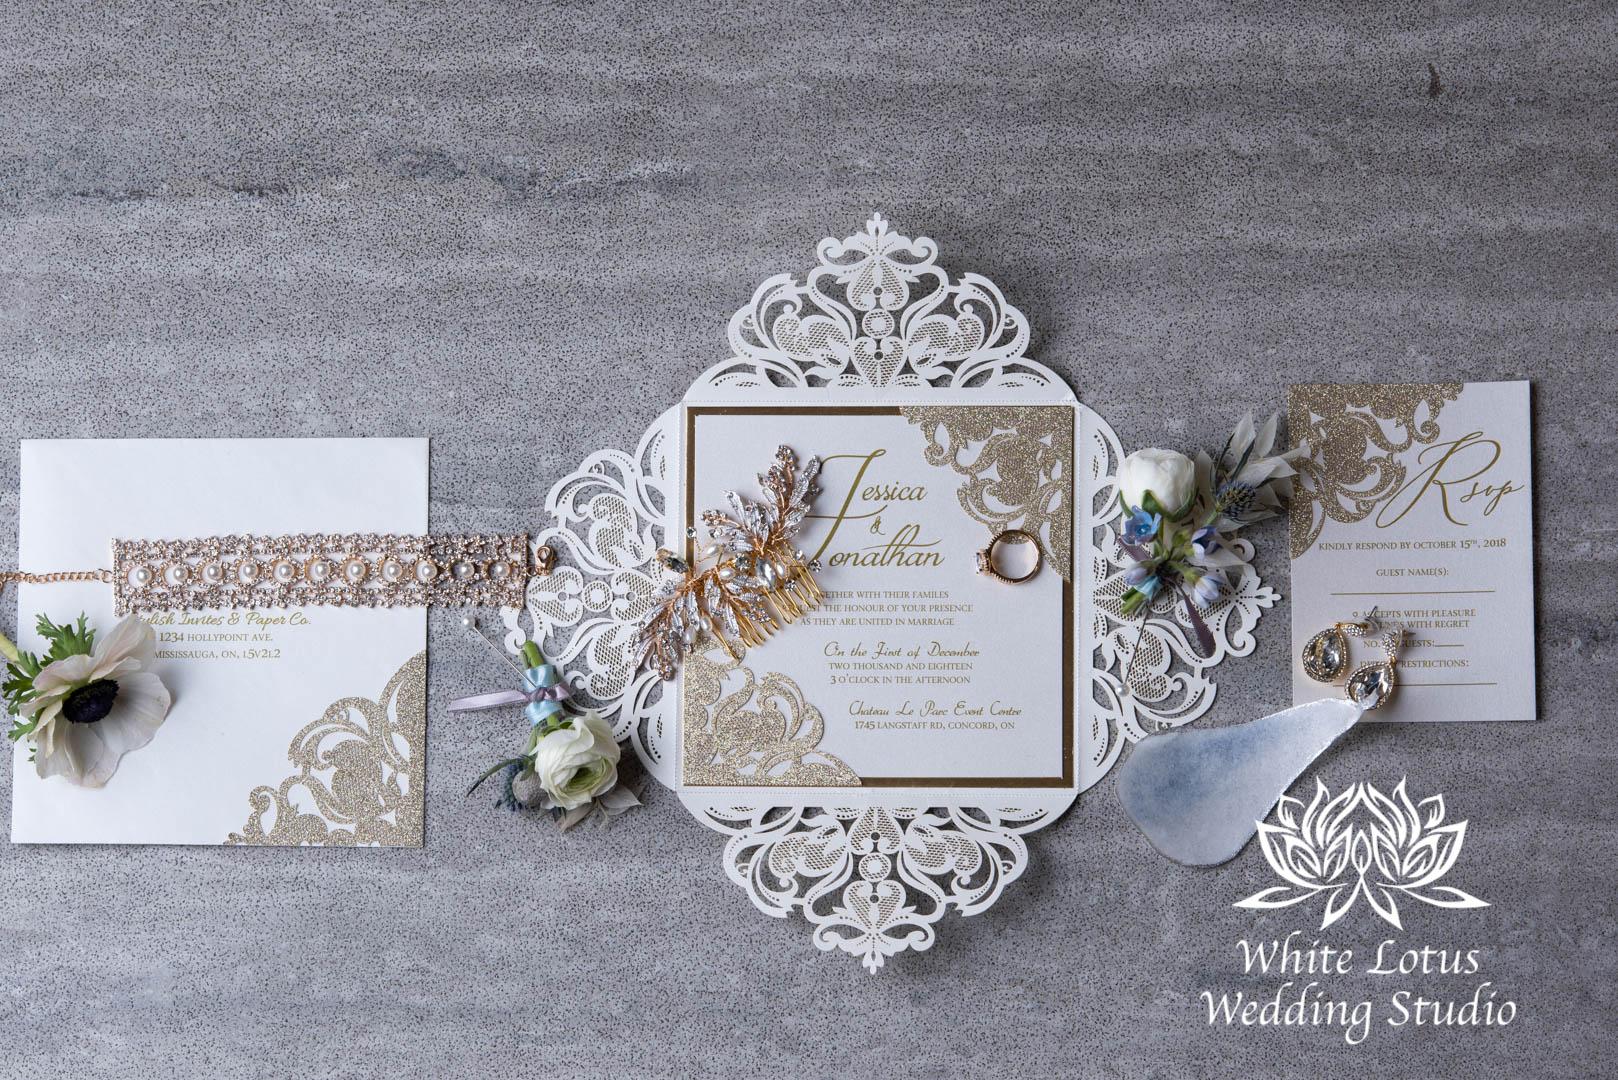 002- GLAM WINTERLUXE WEDDING INSPIRATION